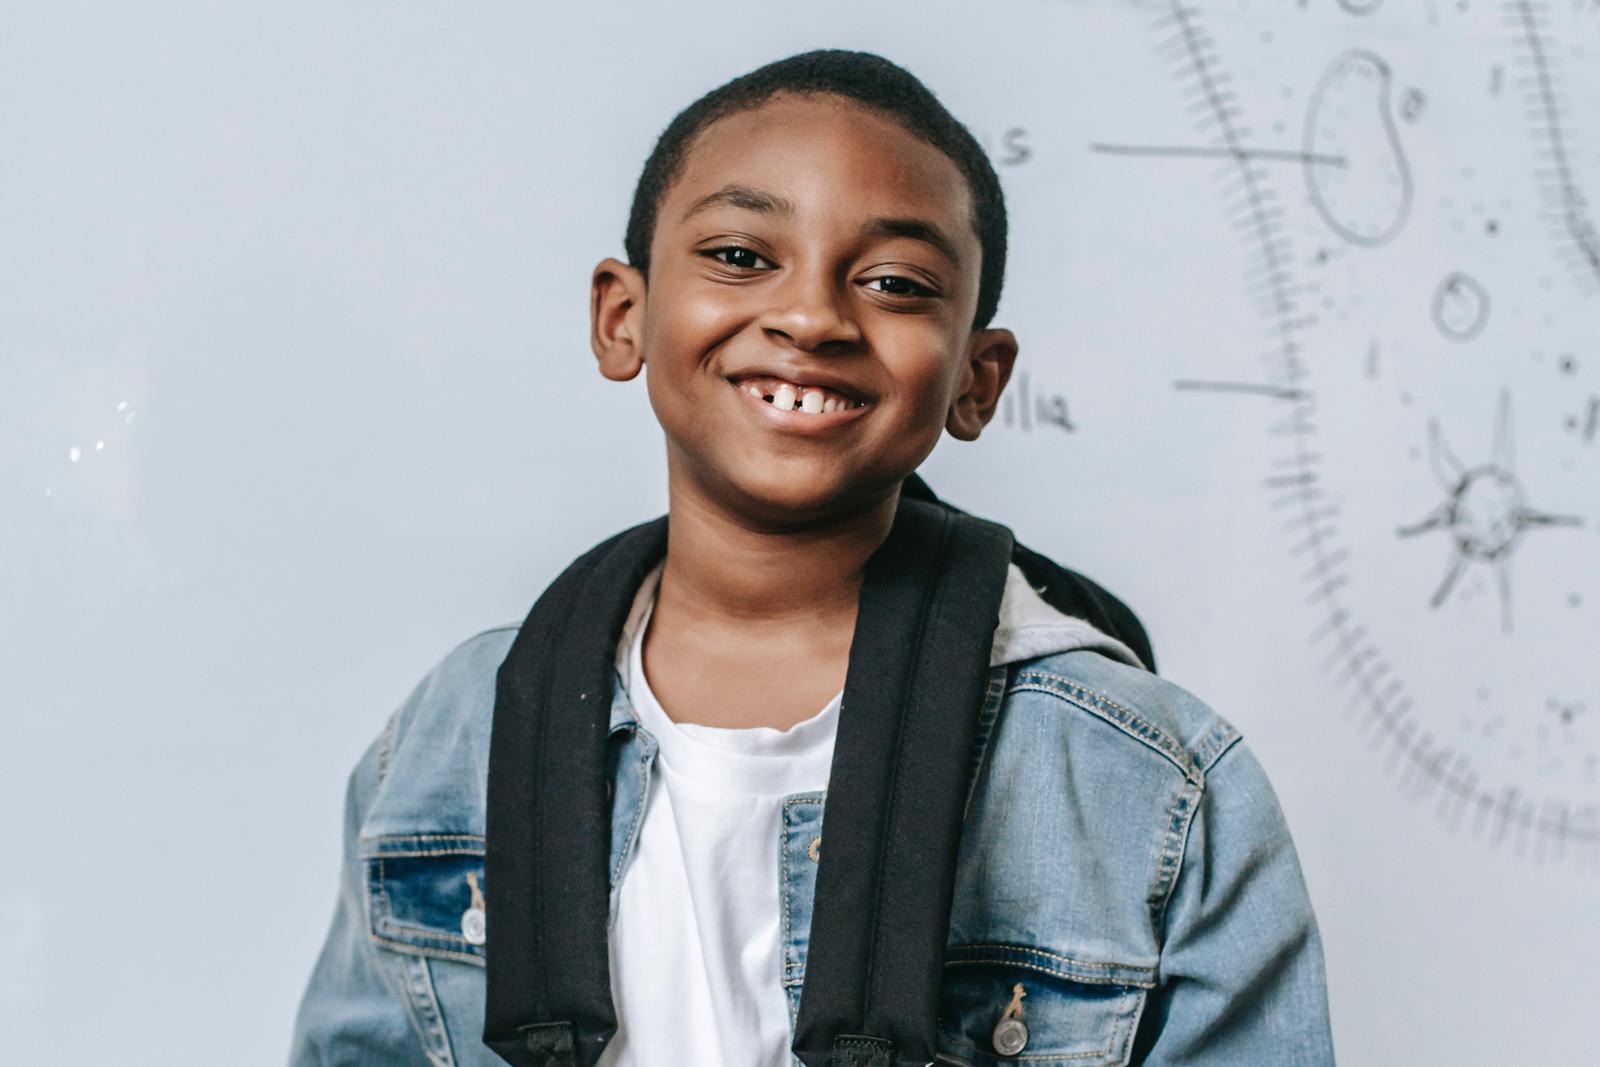 black boy wearing backpack in science classroom